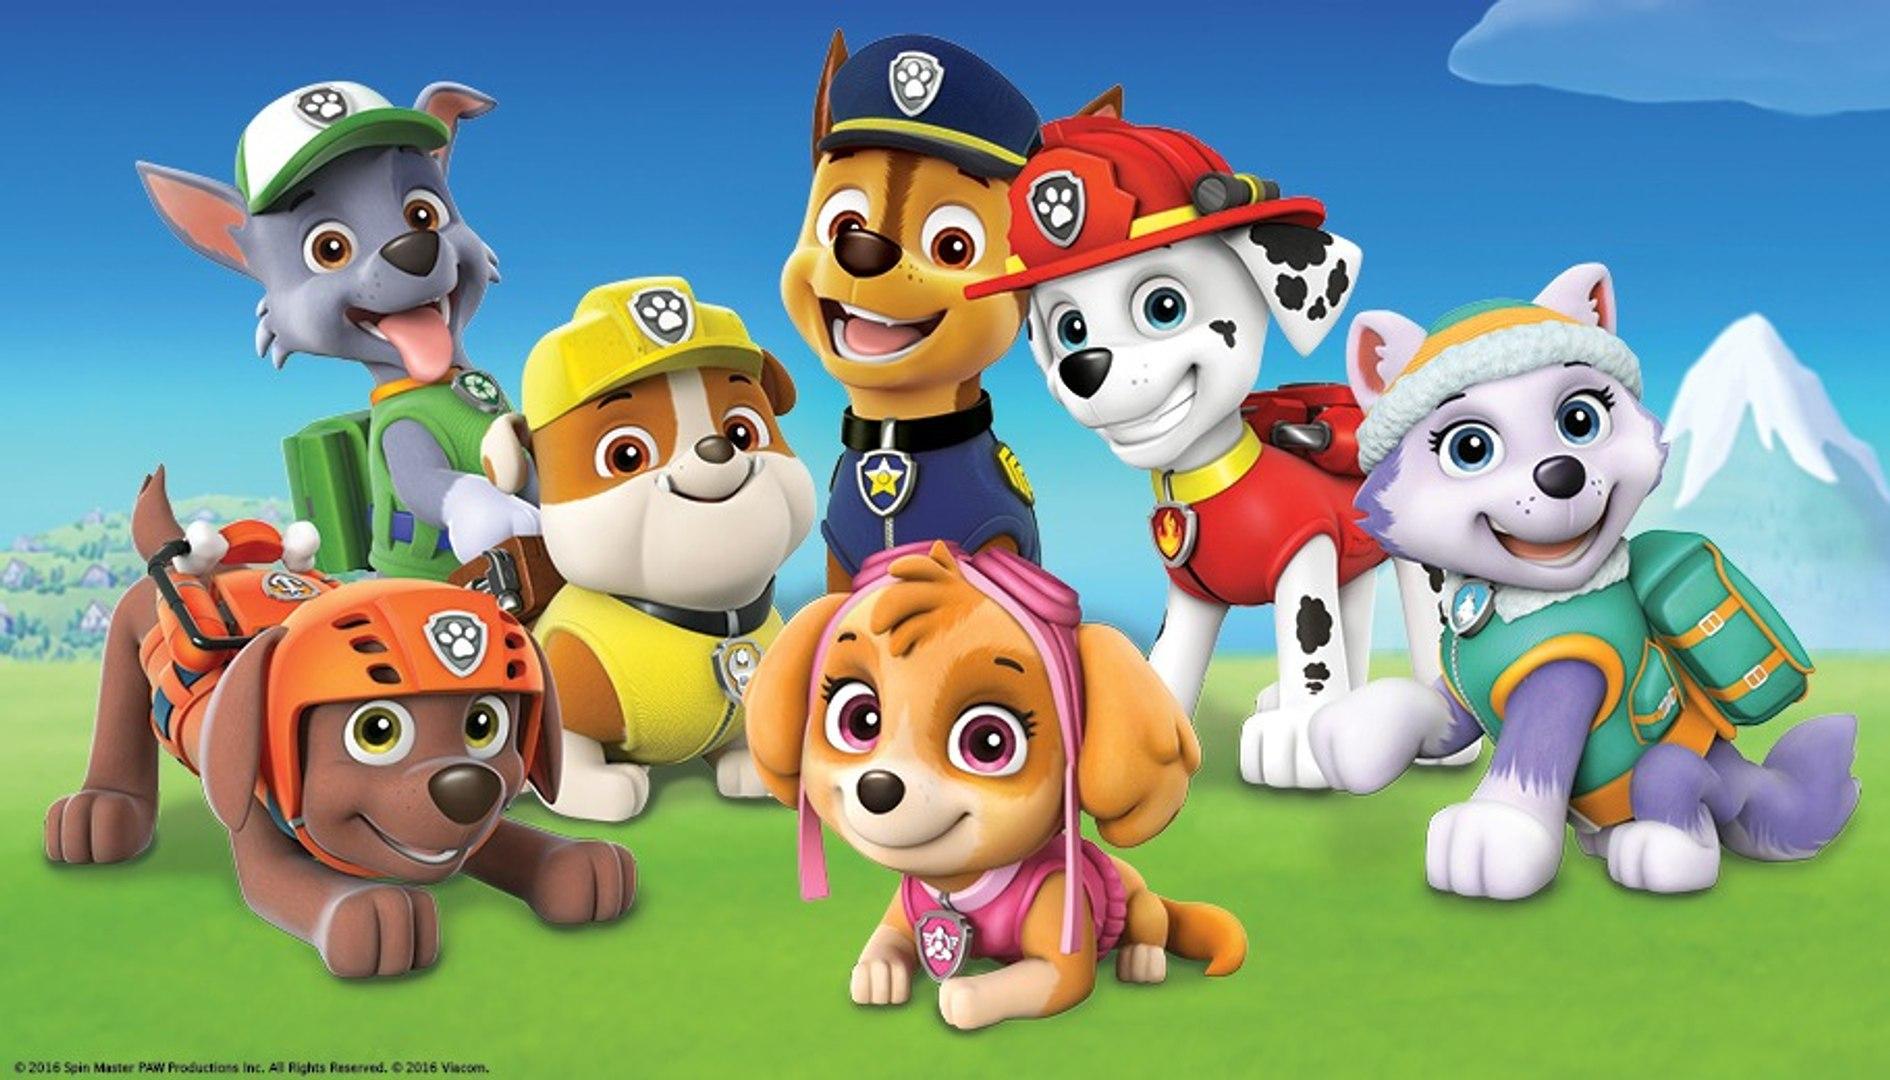 PAW Patrol English Full Episodes || Pups save cartoon full episodes 2017